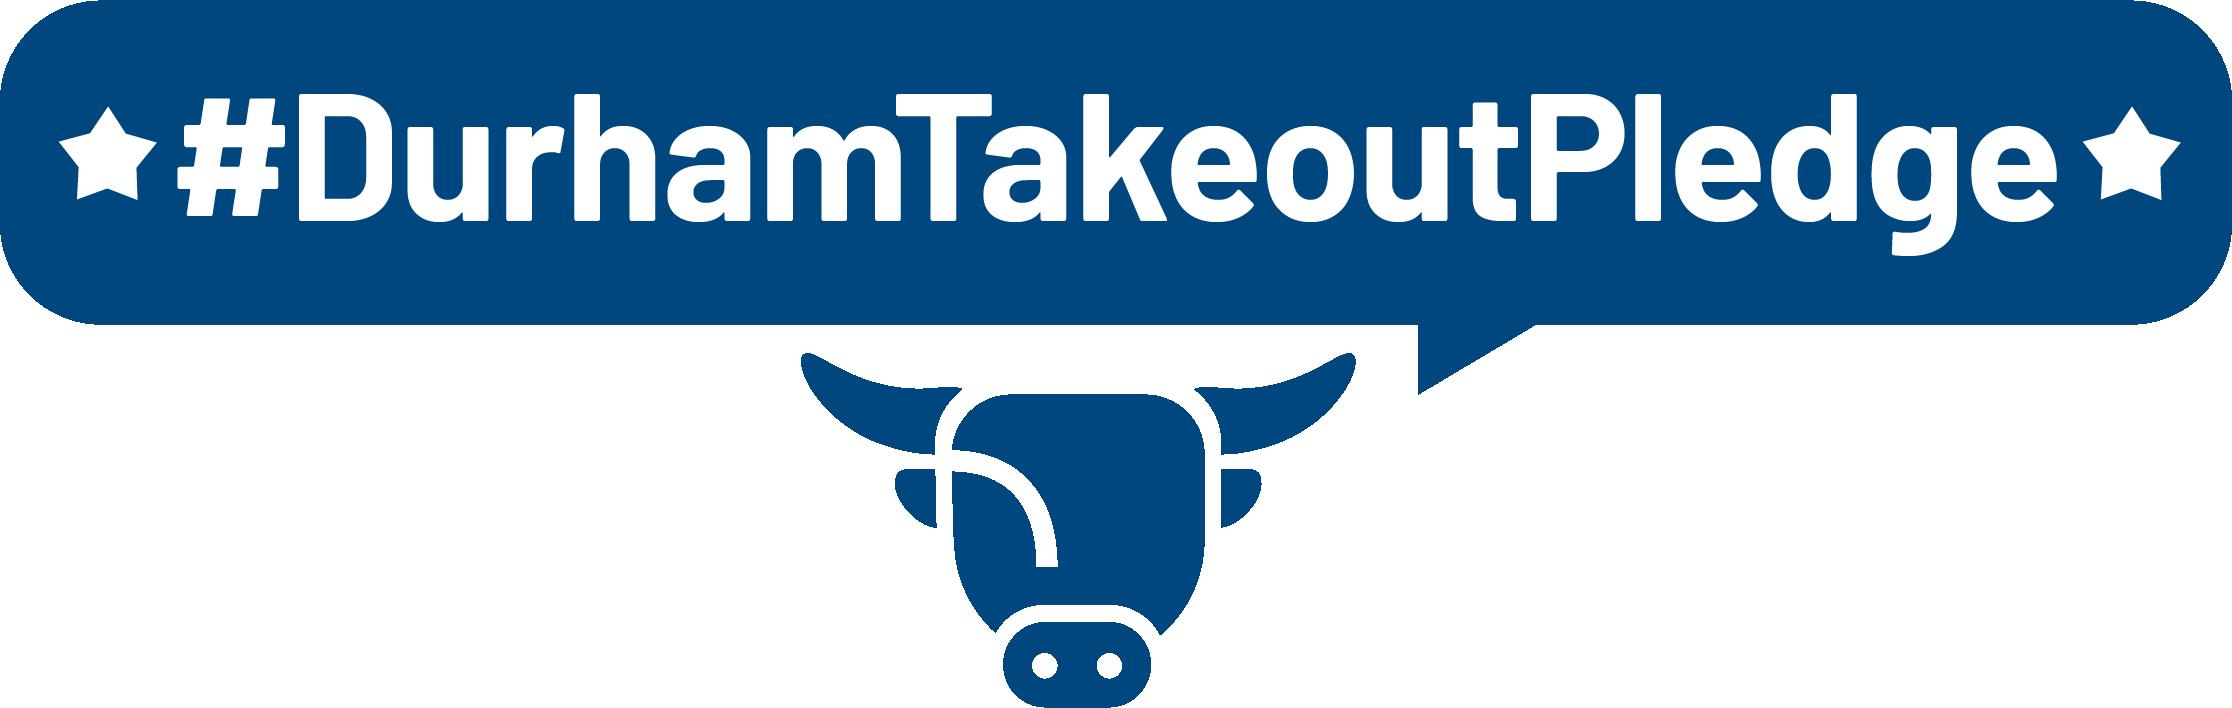 Durham Takeout Pledge logo